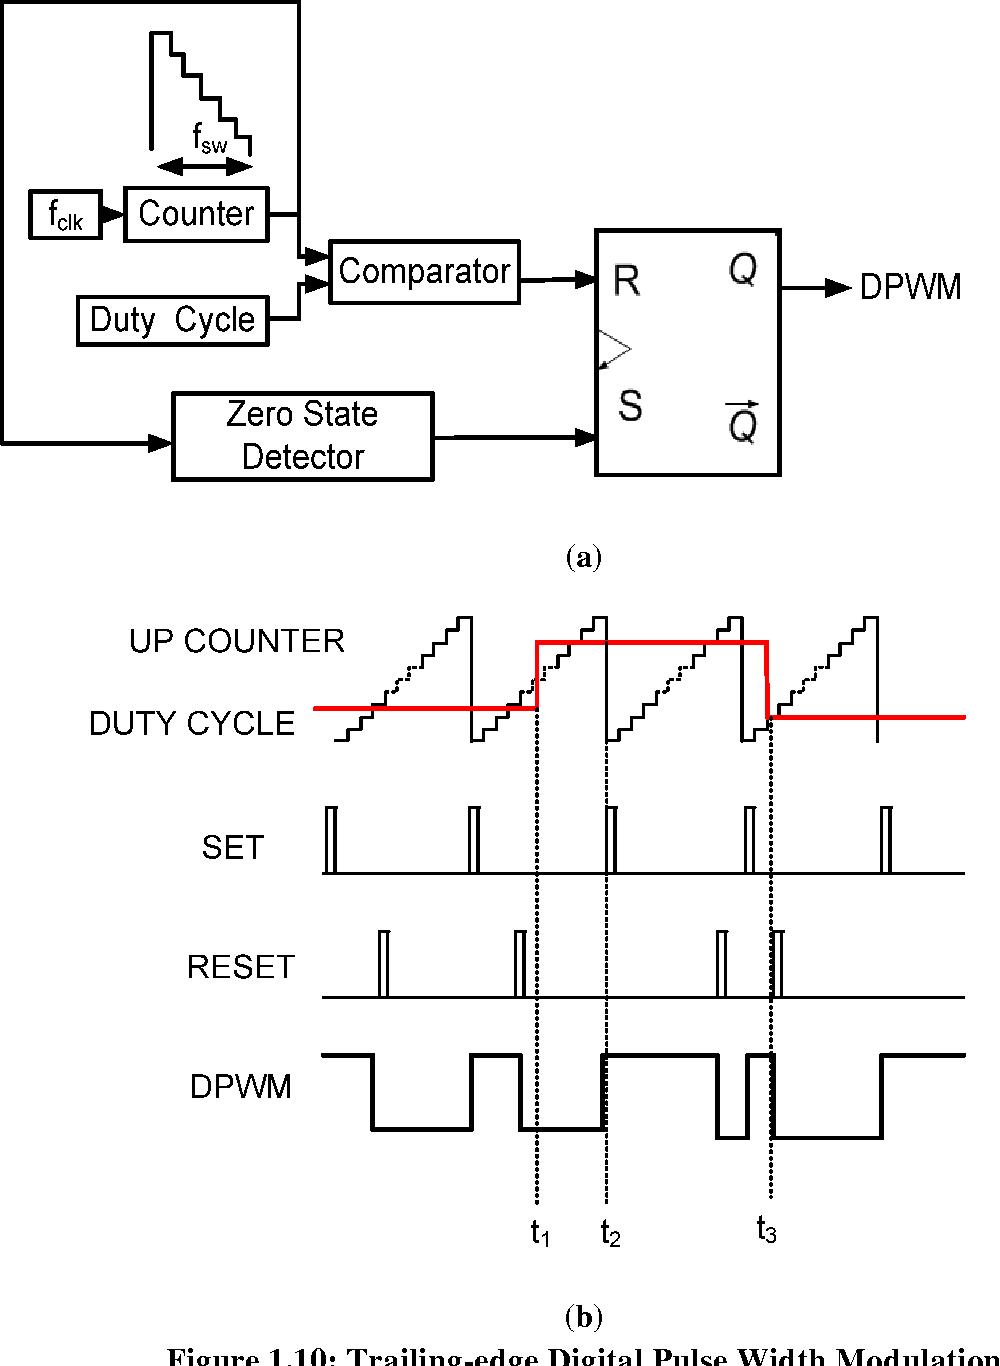 Digital Pulse Width Modulation Techniques For Power Converters By 8211 What Is It Thanukamalam Arunachalam Semantic Scholar